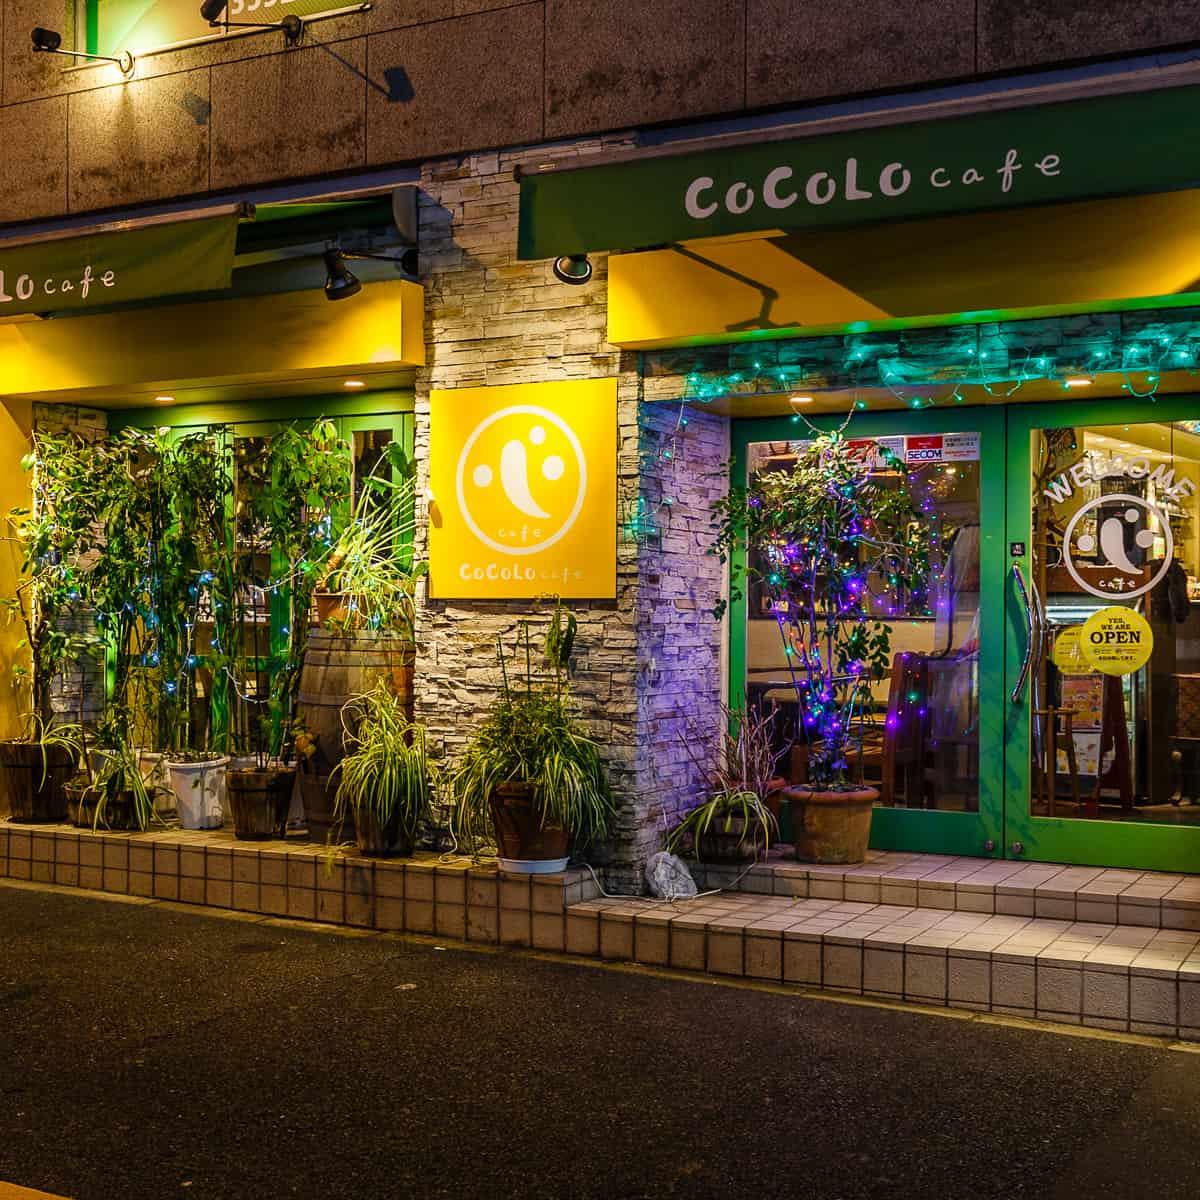 LGBT Cafe in Tokyo : โคโคโระคาเฟ่ (CoCoLo cafe)